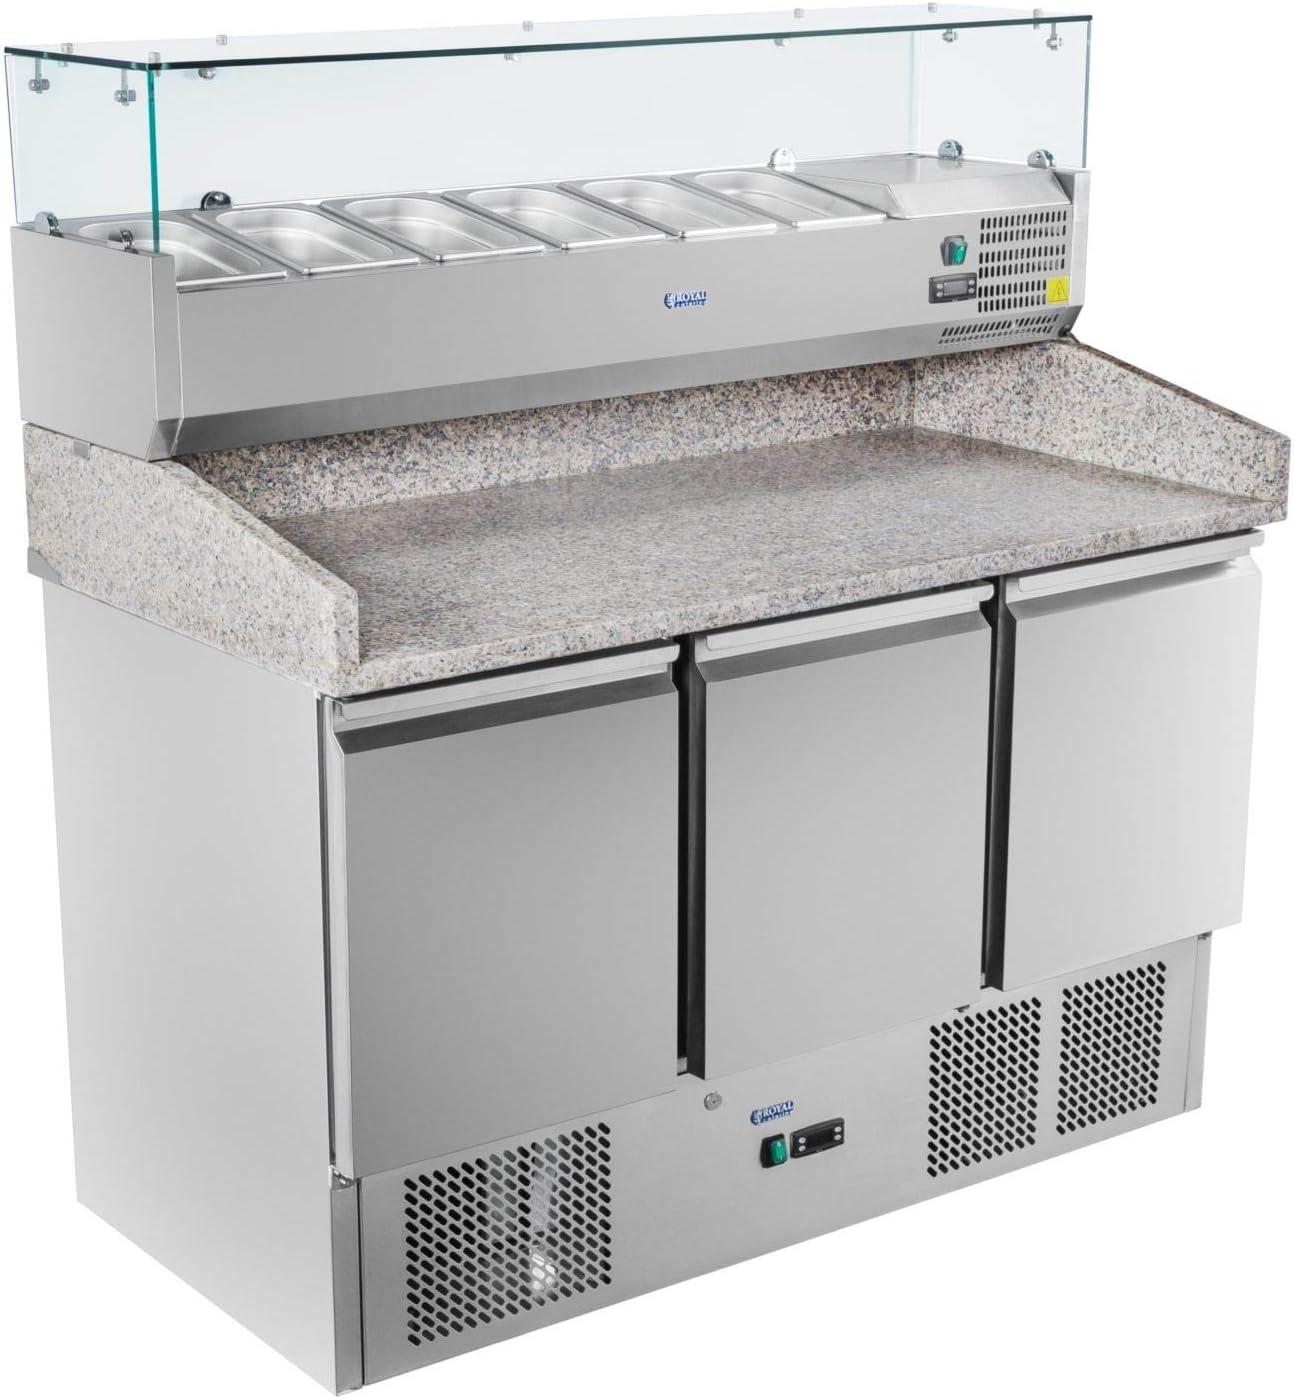 Royal Catering - RCKT-140/70-V - Bajomostrador refrigerado - 140x70cm - de granito - 380 l - 300 watt: Amazon.es: Hogar